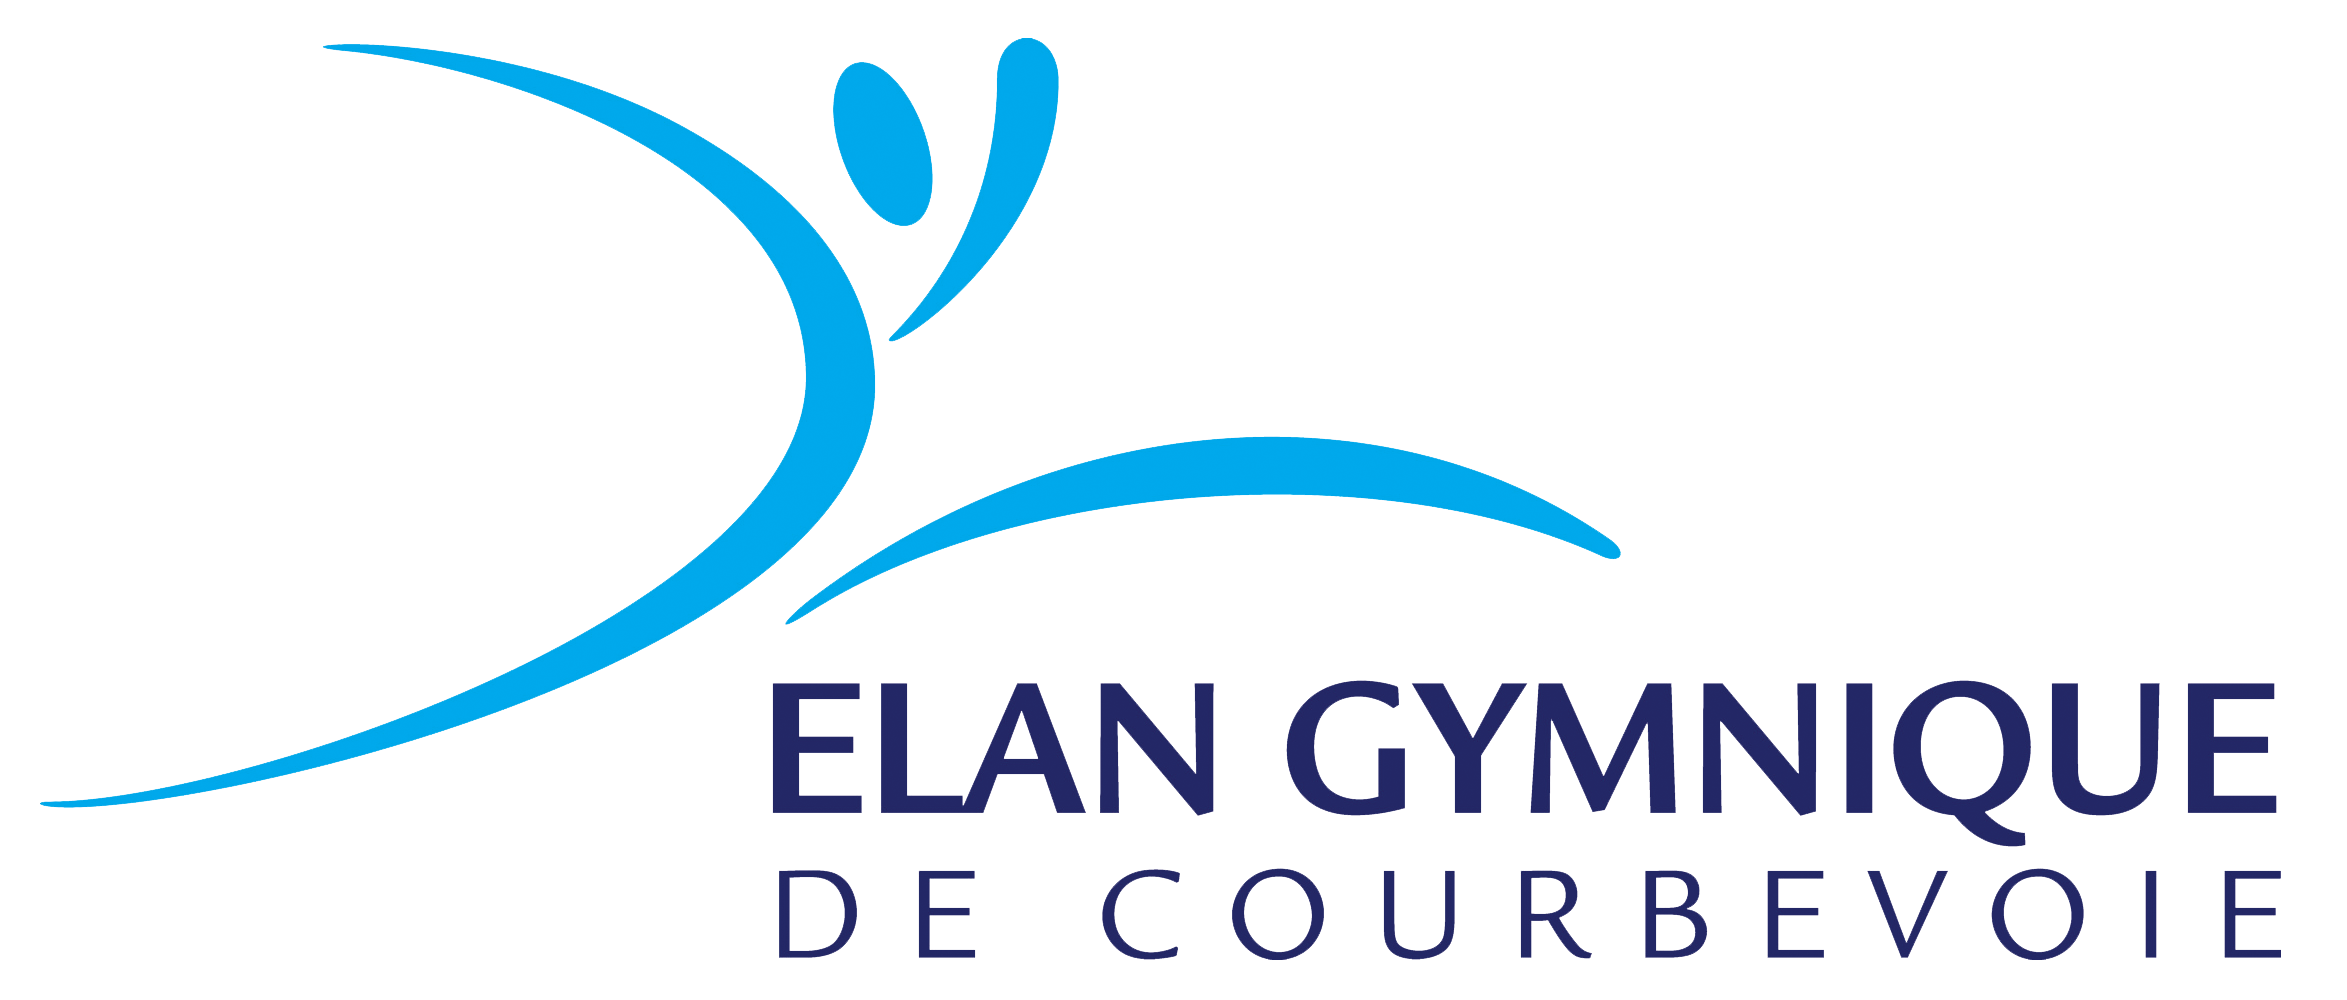 Elan Gymnique de Courbevoie